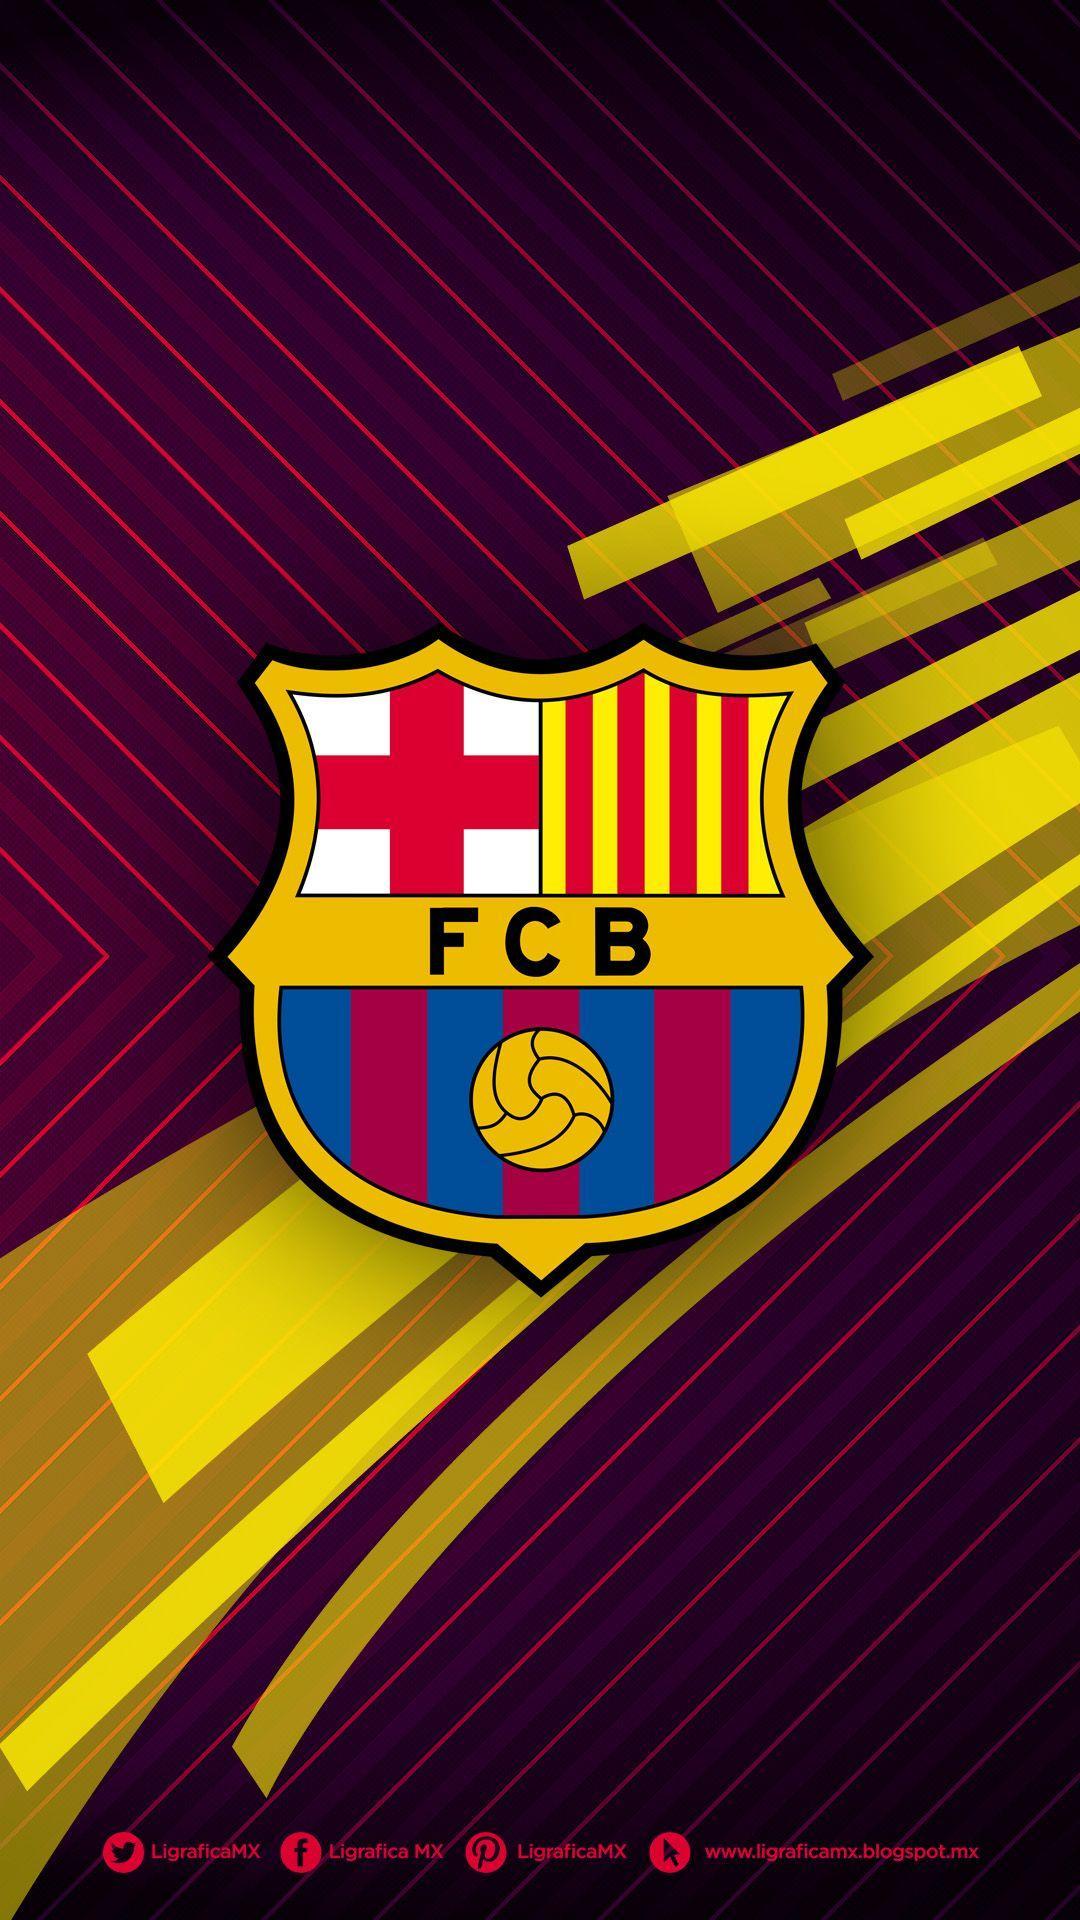 Lambang Barcelona : lambang, barcelona, Barcelona, Wallpapers, Wallpaper